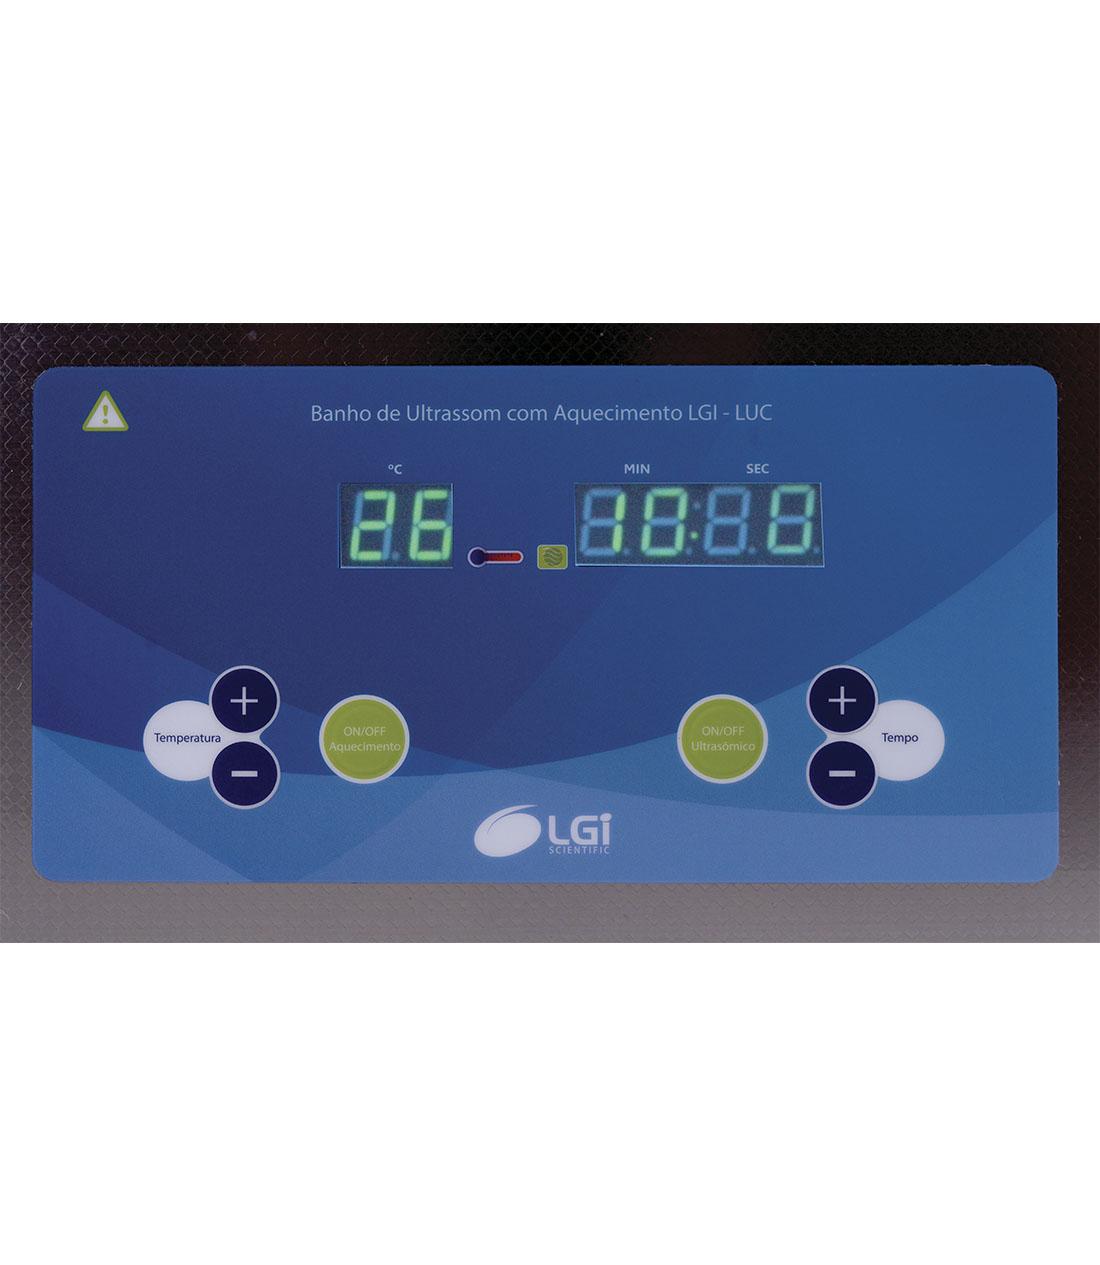 BANHO DE ULTRASOM 30 L - LGI SCIENTIFIC - Cód. LGI-LUC-600